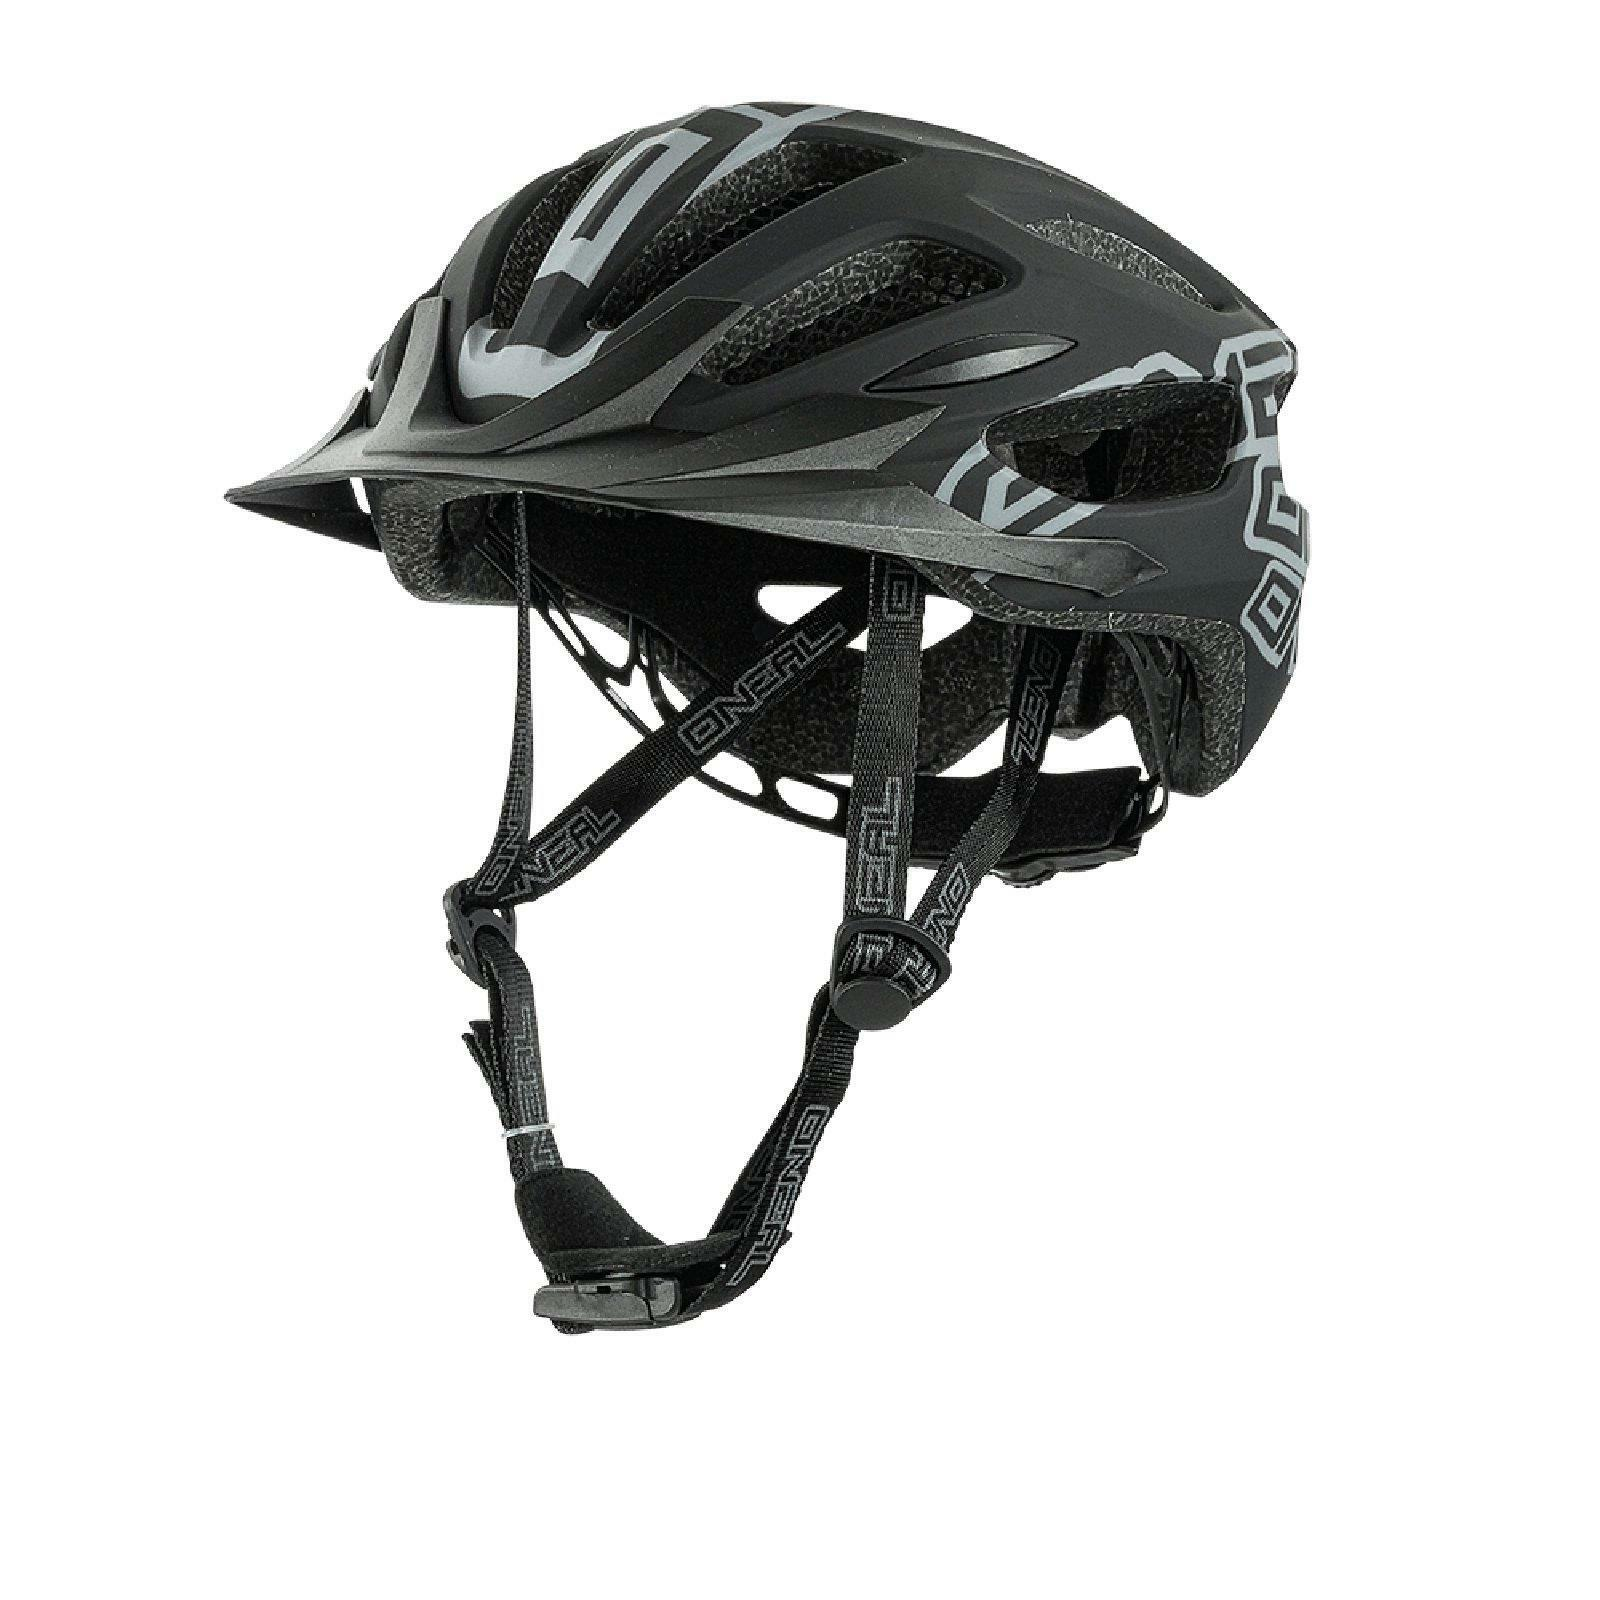 ONeal Q RL Helm MTB black Matt All Mountain Bike Enduro Fahrrad Trail Freerid